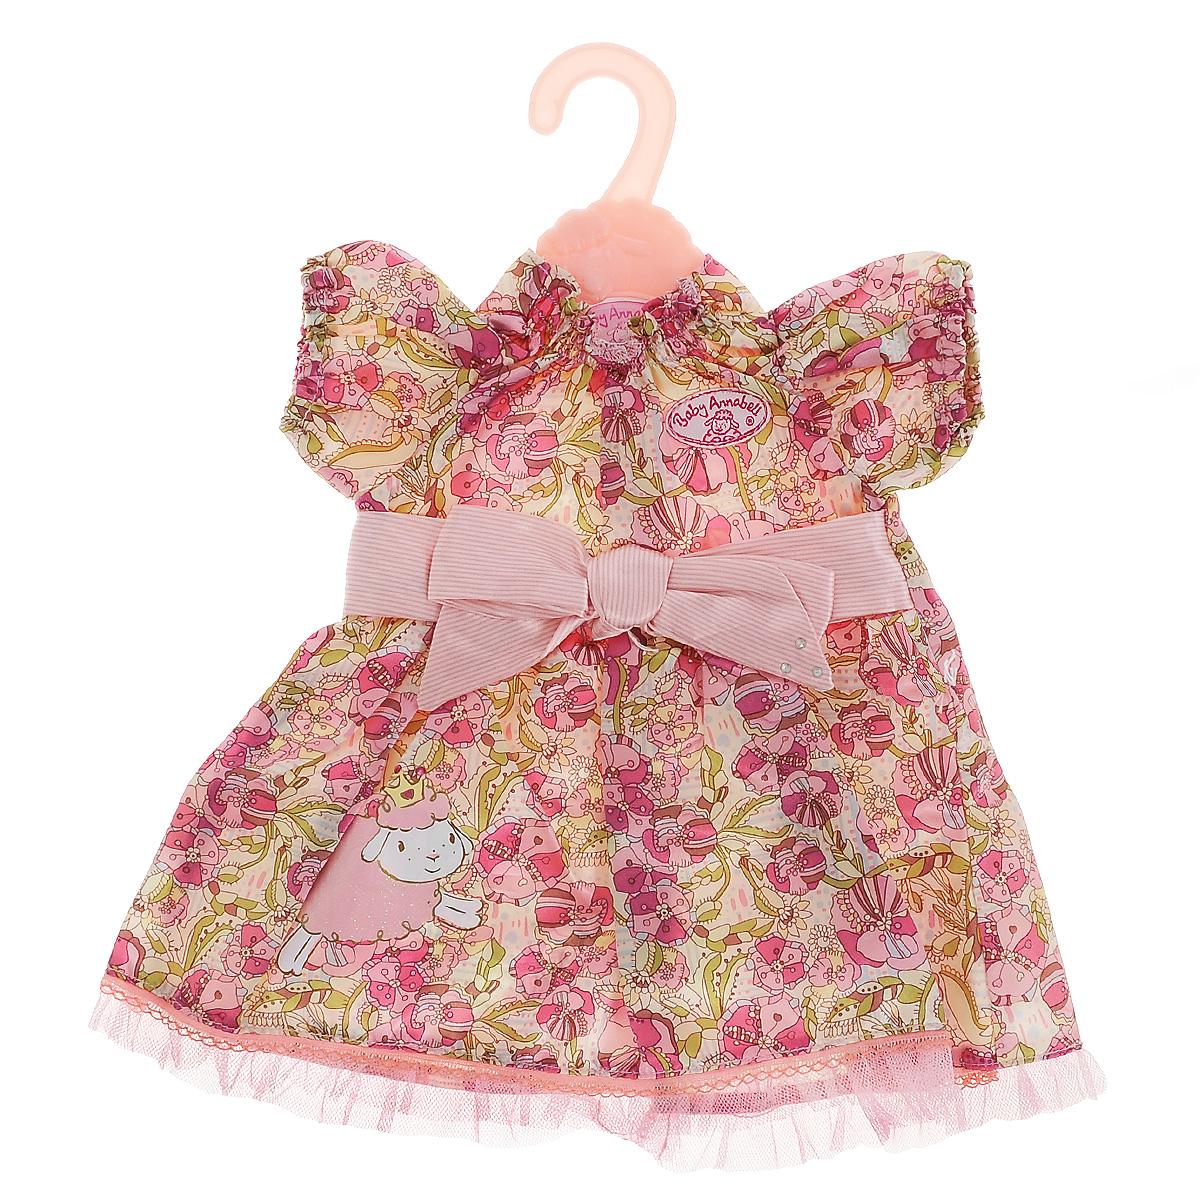 Baby Annabell Одежда для куклы «Платье», цвет: красный, розовый, зеленый